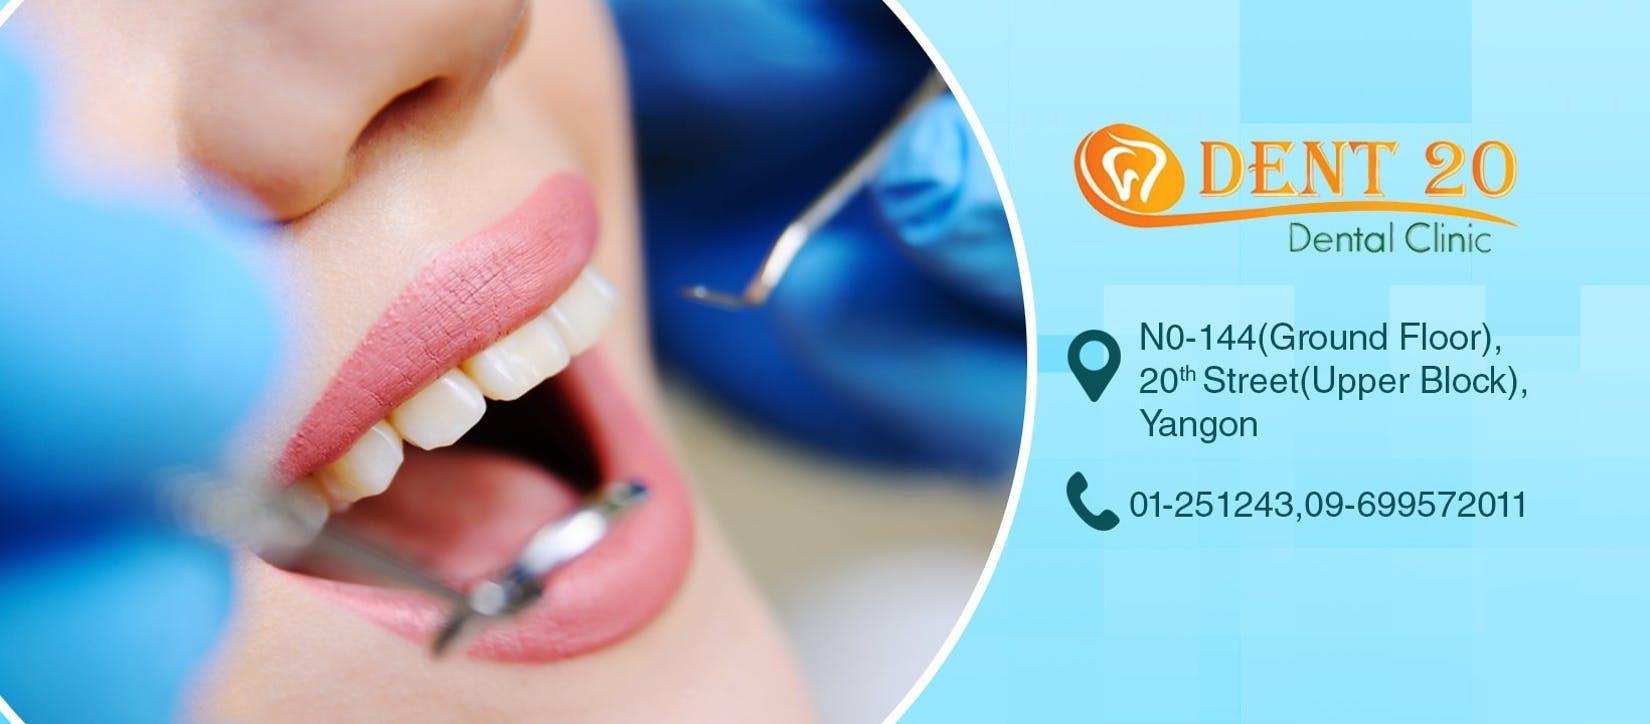 Dent 20 Dental Clinic | Medical